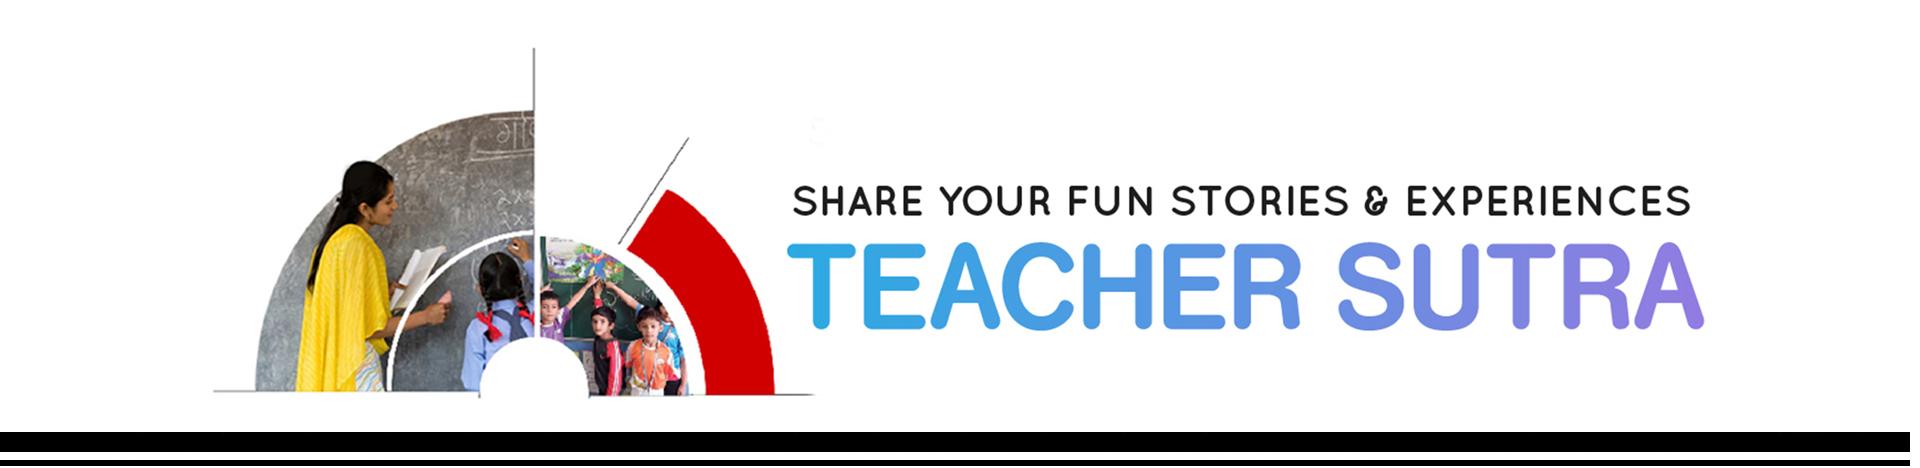 sos childrens villages partnering with tickLinks - Free Online Learning Platform